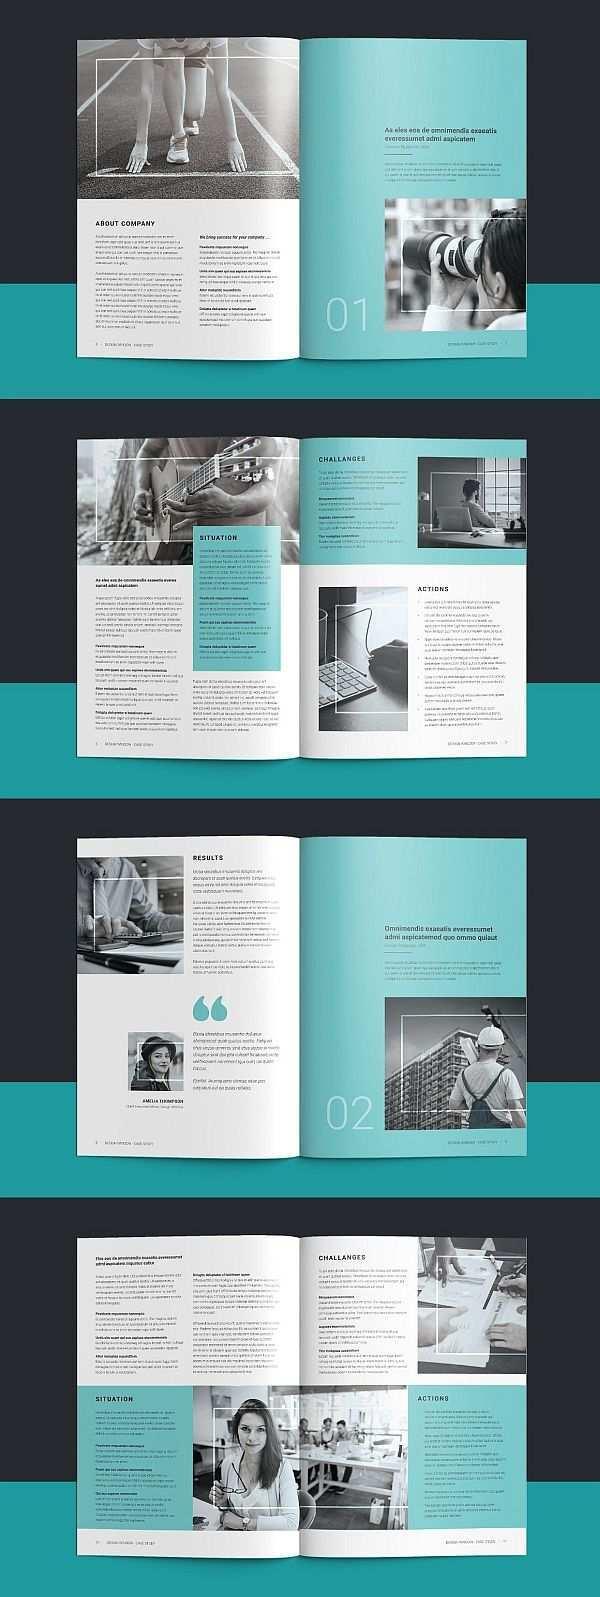 45 Corporate Brochure Templates For Adobe Indesign Booklet Design Brochure Design Layout Booklet Template